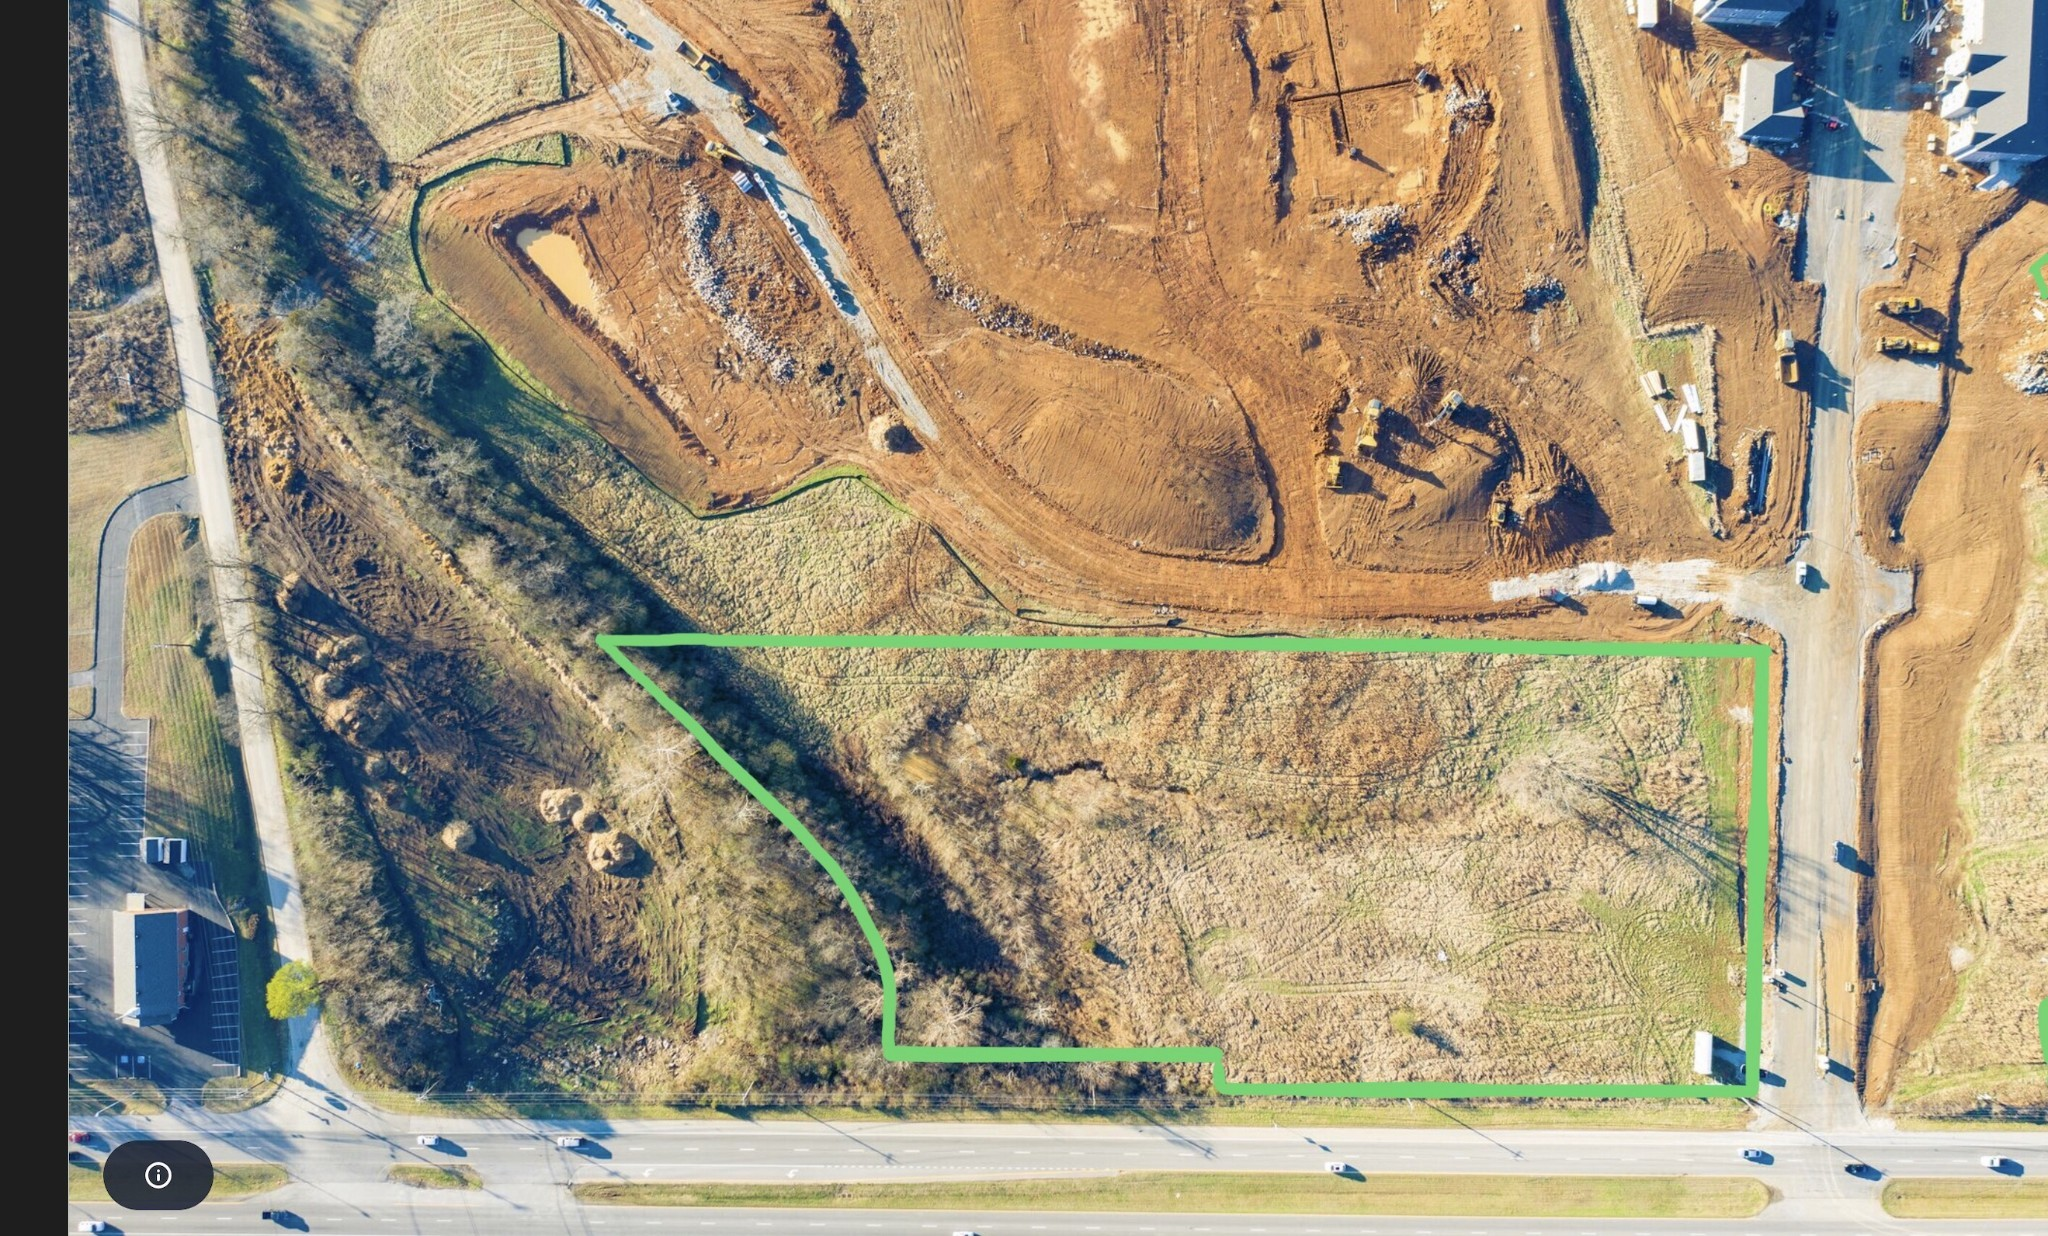 1683 NASHVILLE HWY, Columbia, TN 38401 - Columbia, TN real estate listing